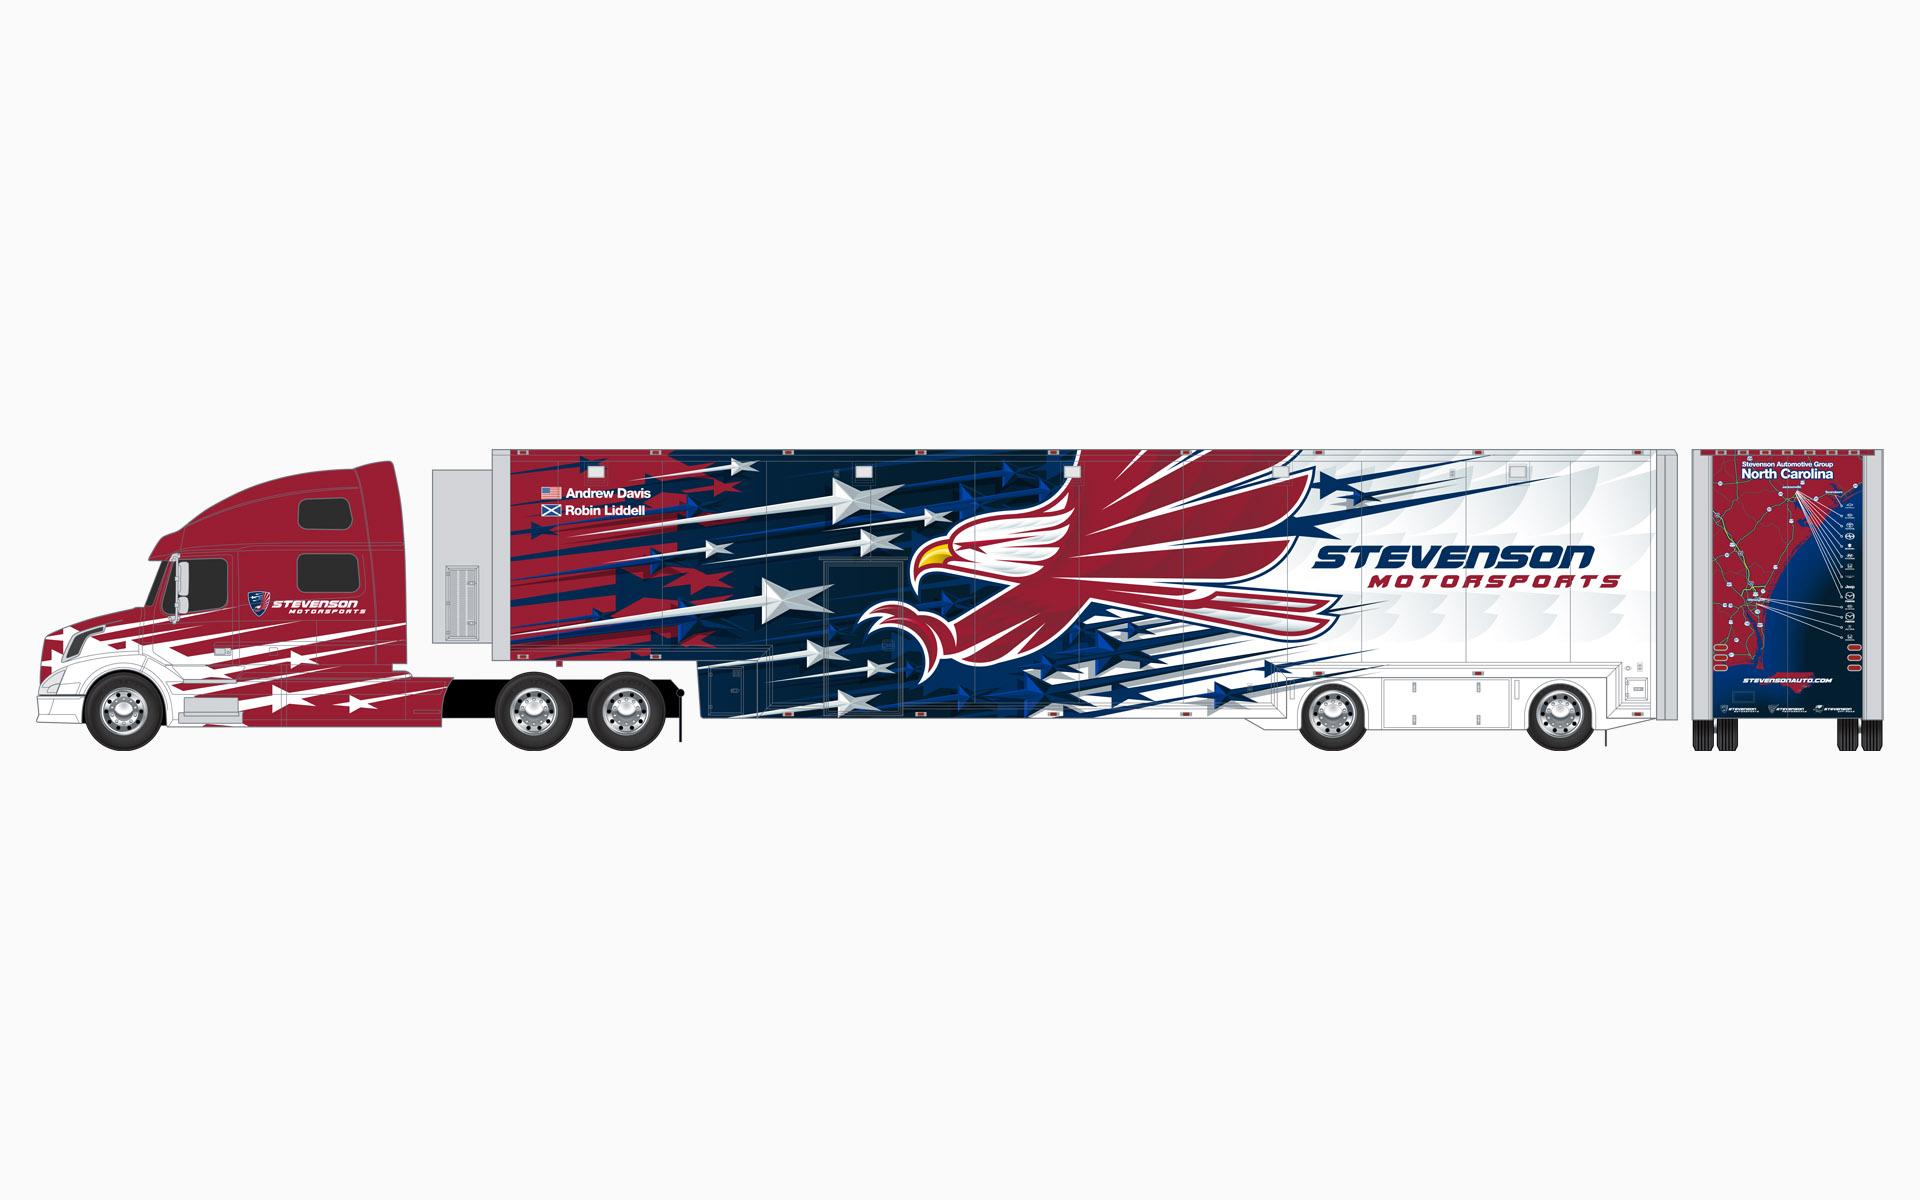 Stevenson Motorsports Transporter Livery Elevations